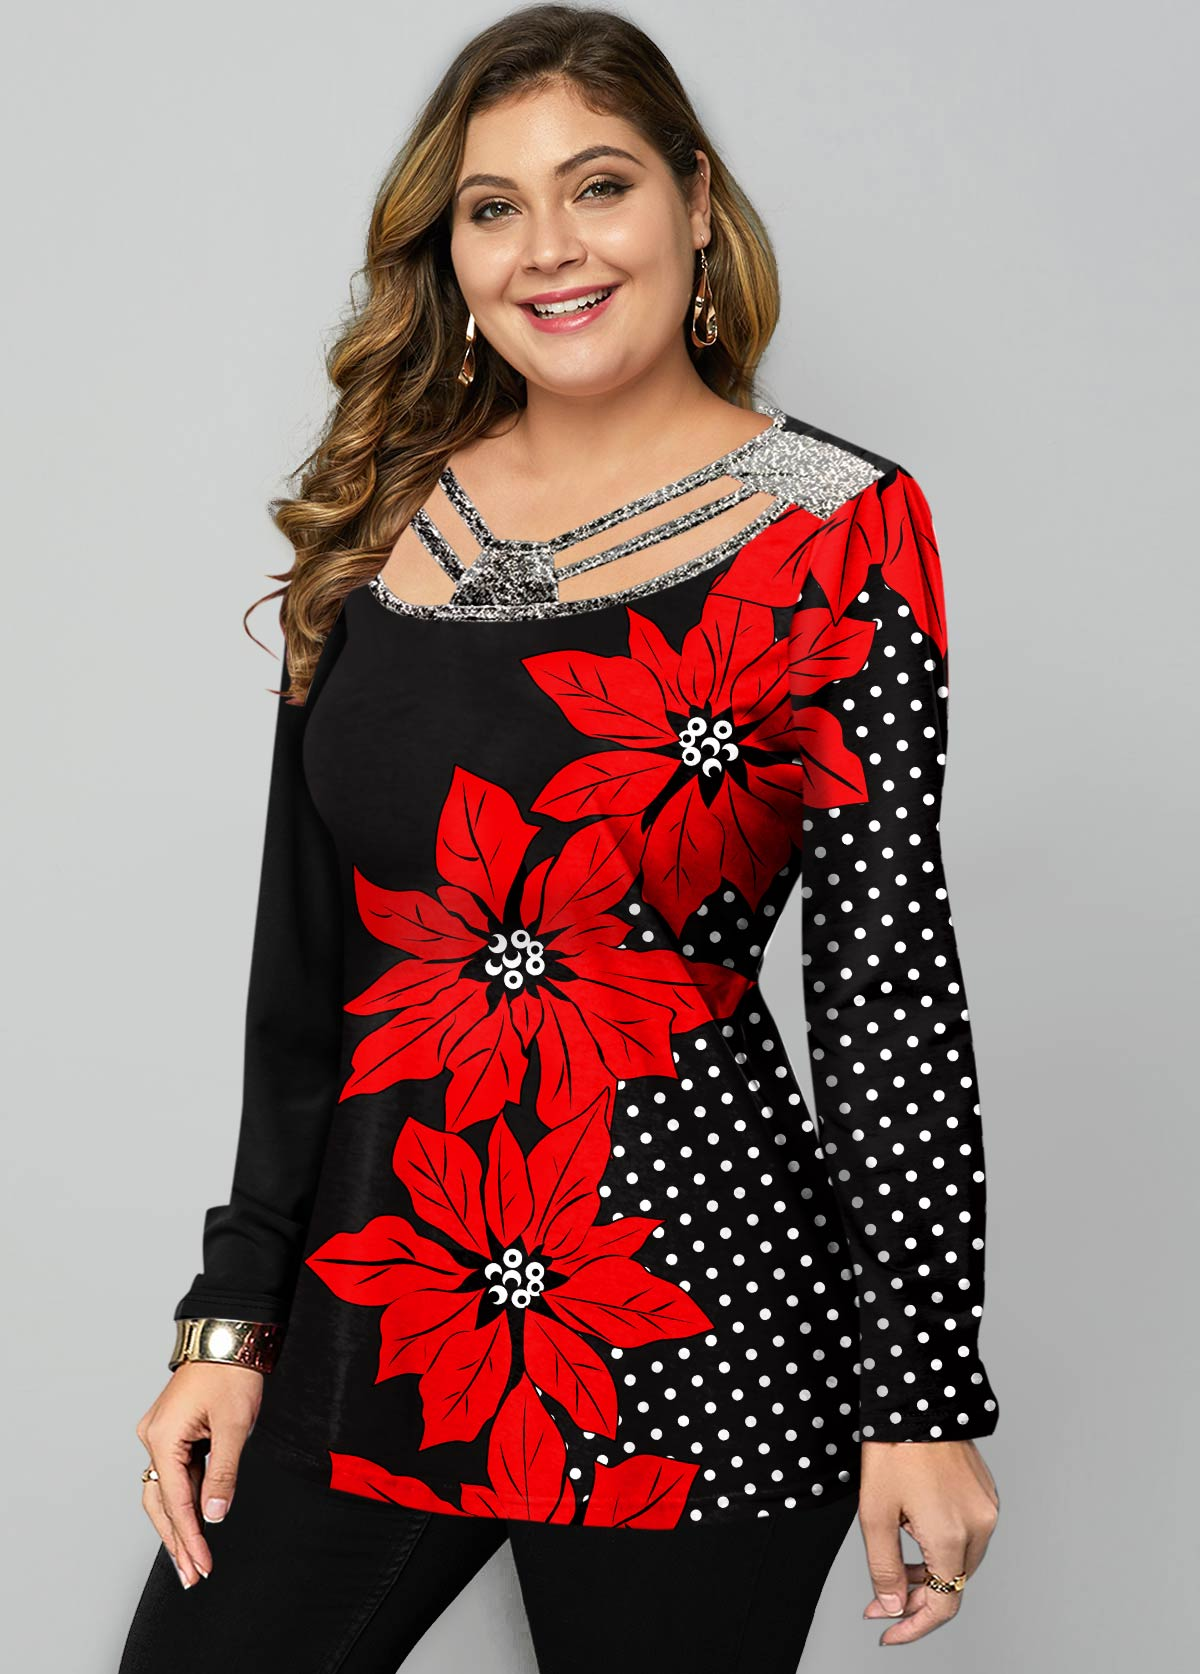 ROTITA Plus Size Polka Dot and Floral Print T Shirt